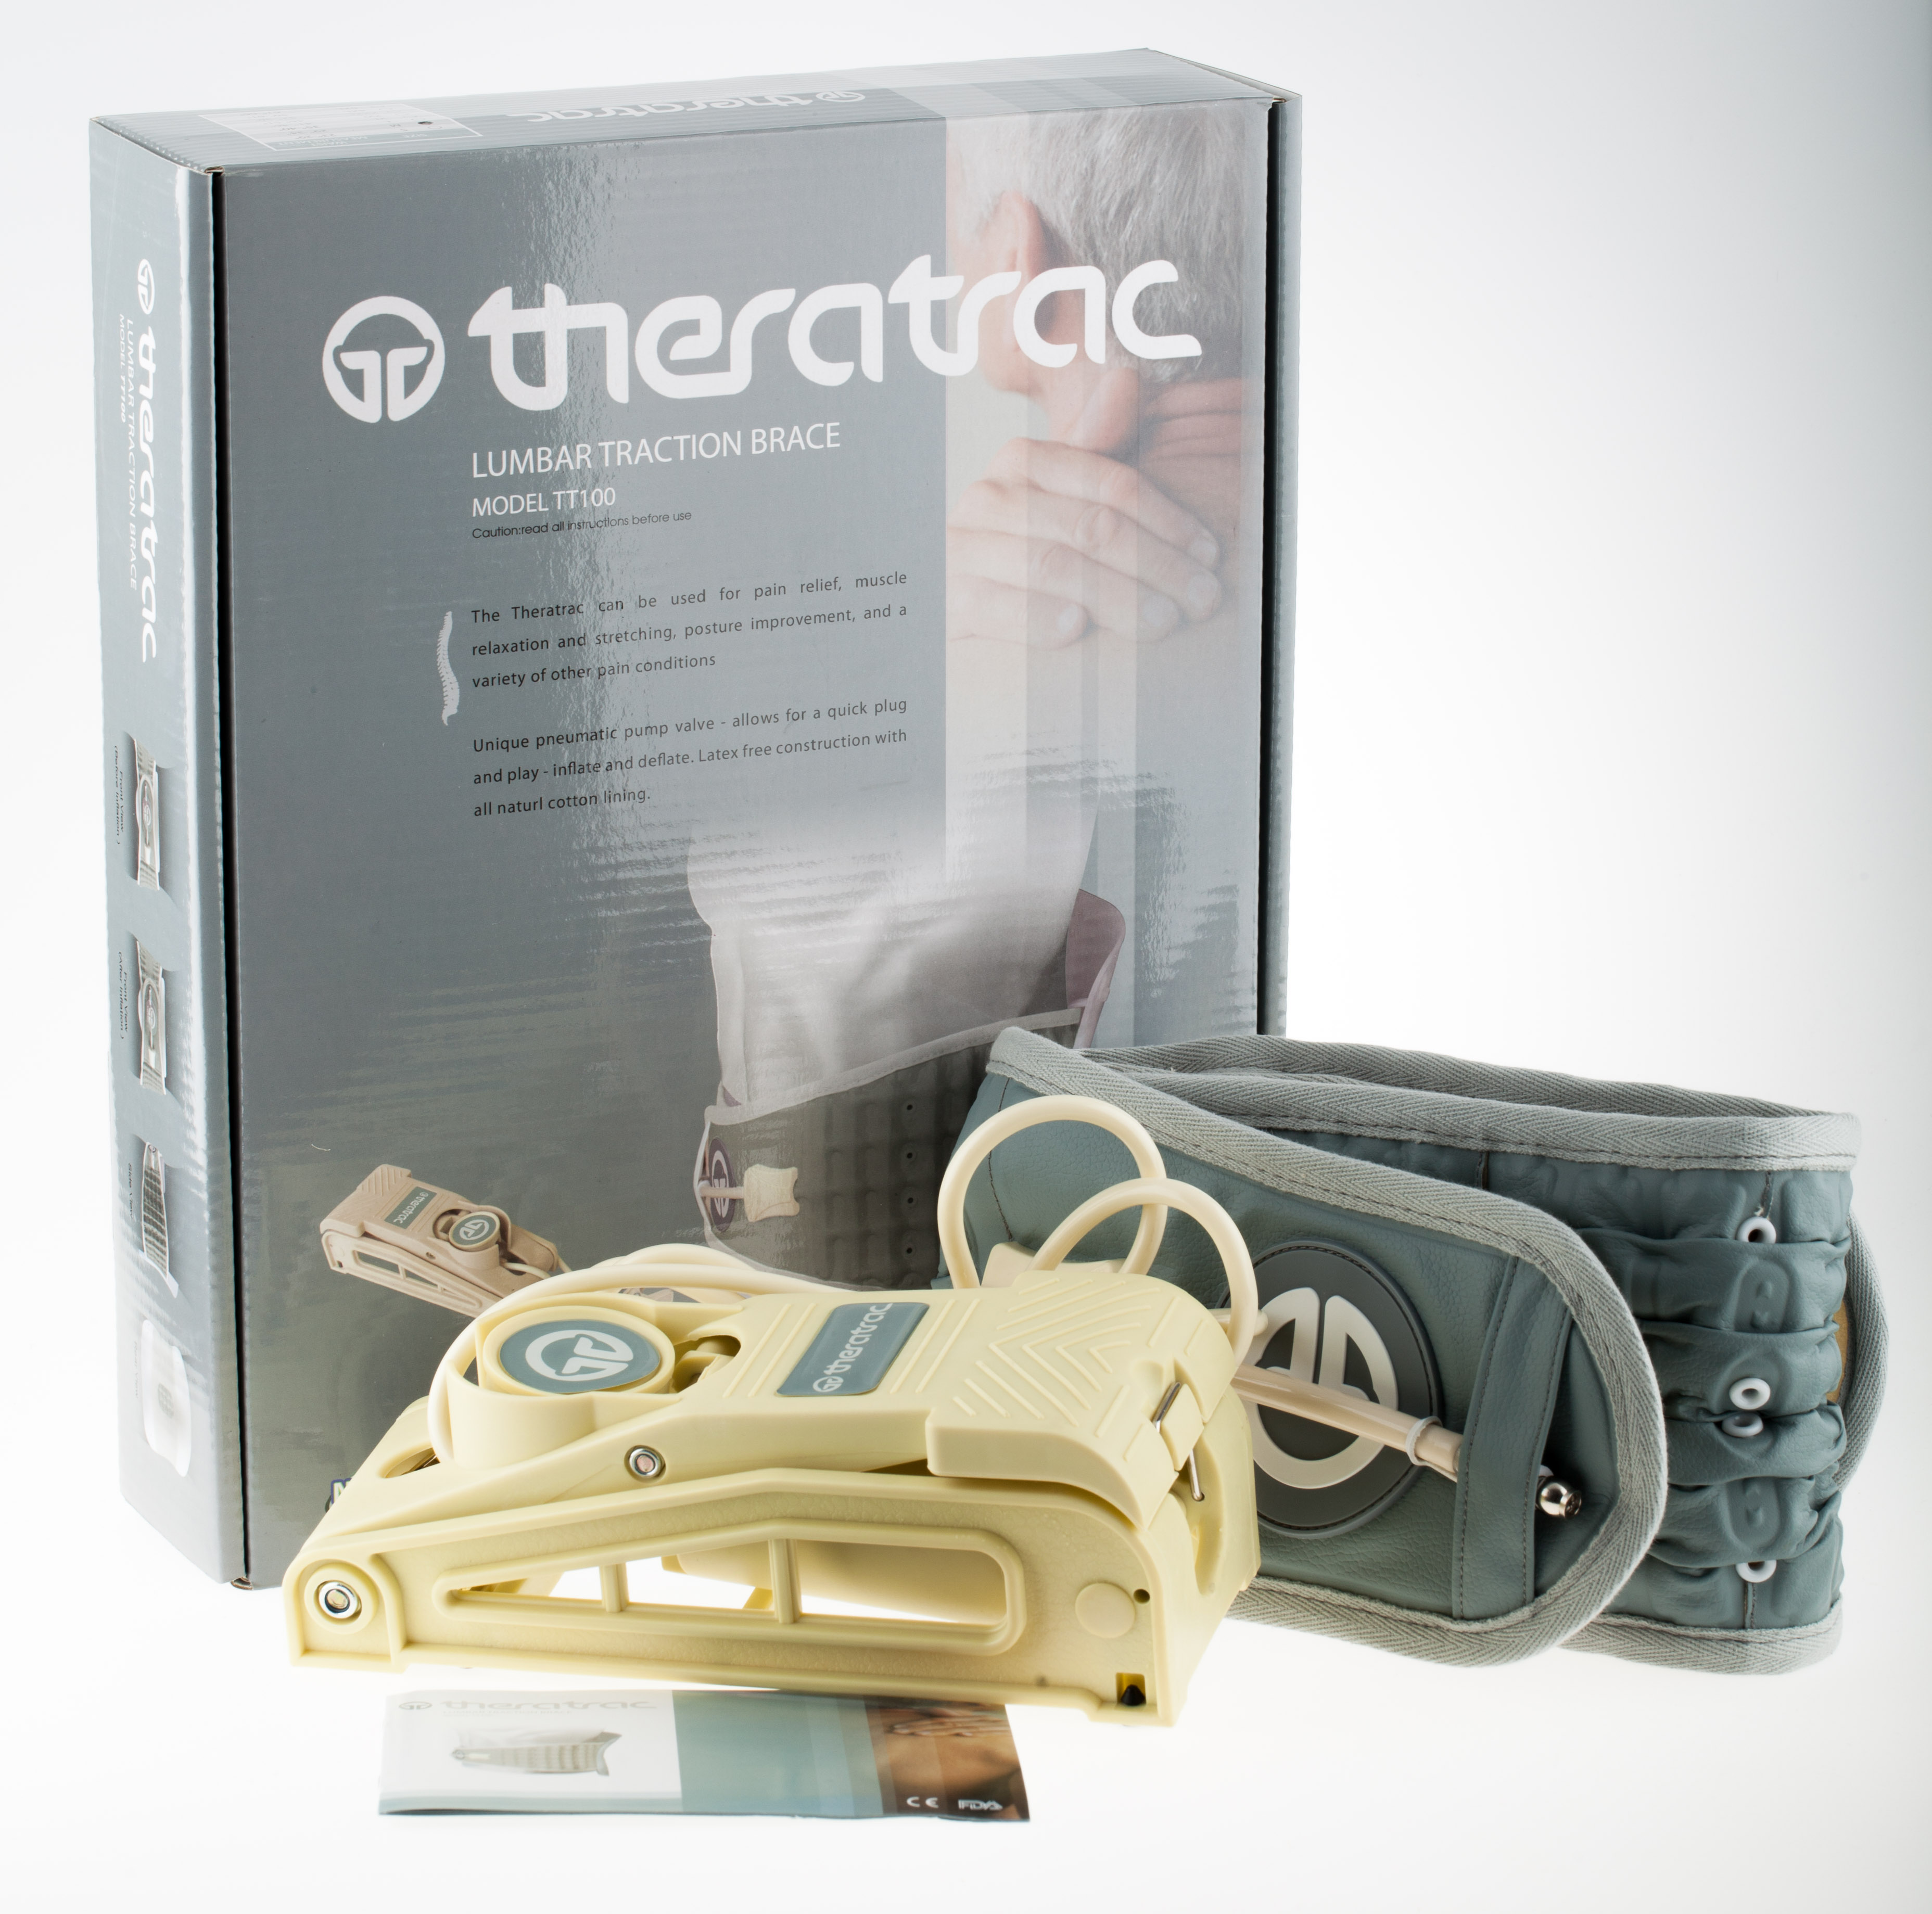 Theratrac Lumbar traction Brace